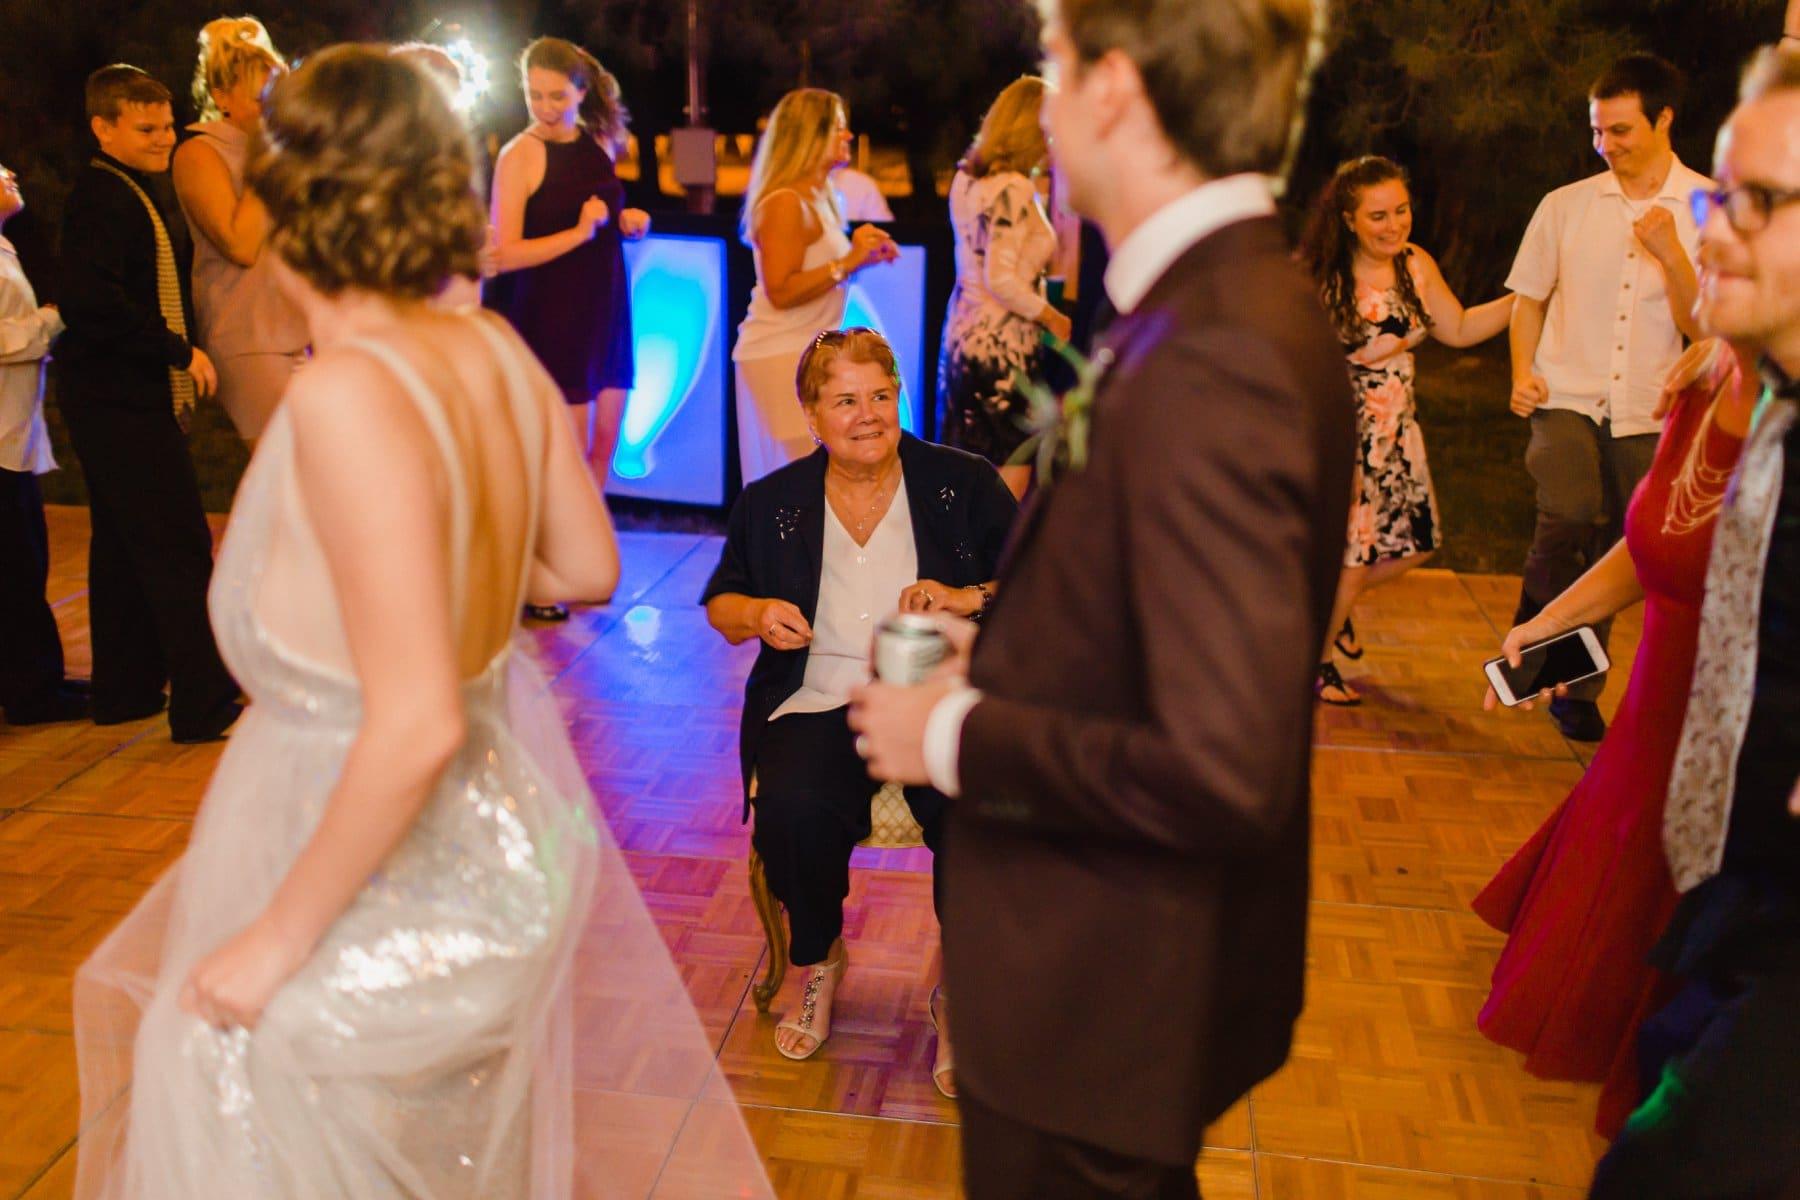 wedding reception dancing at the Meadow Schnepf Farms